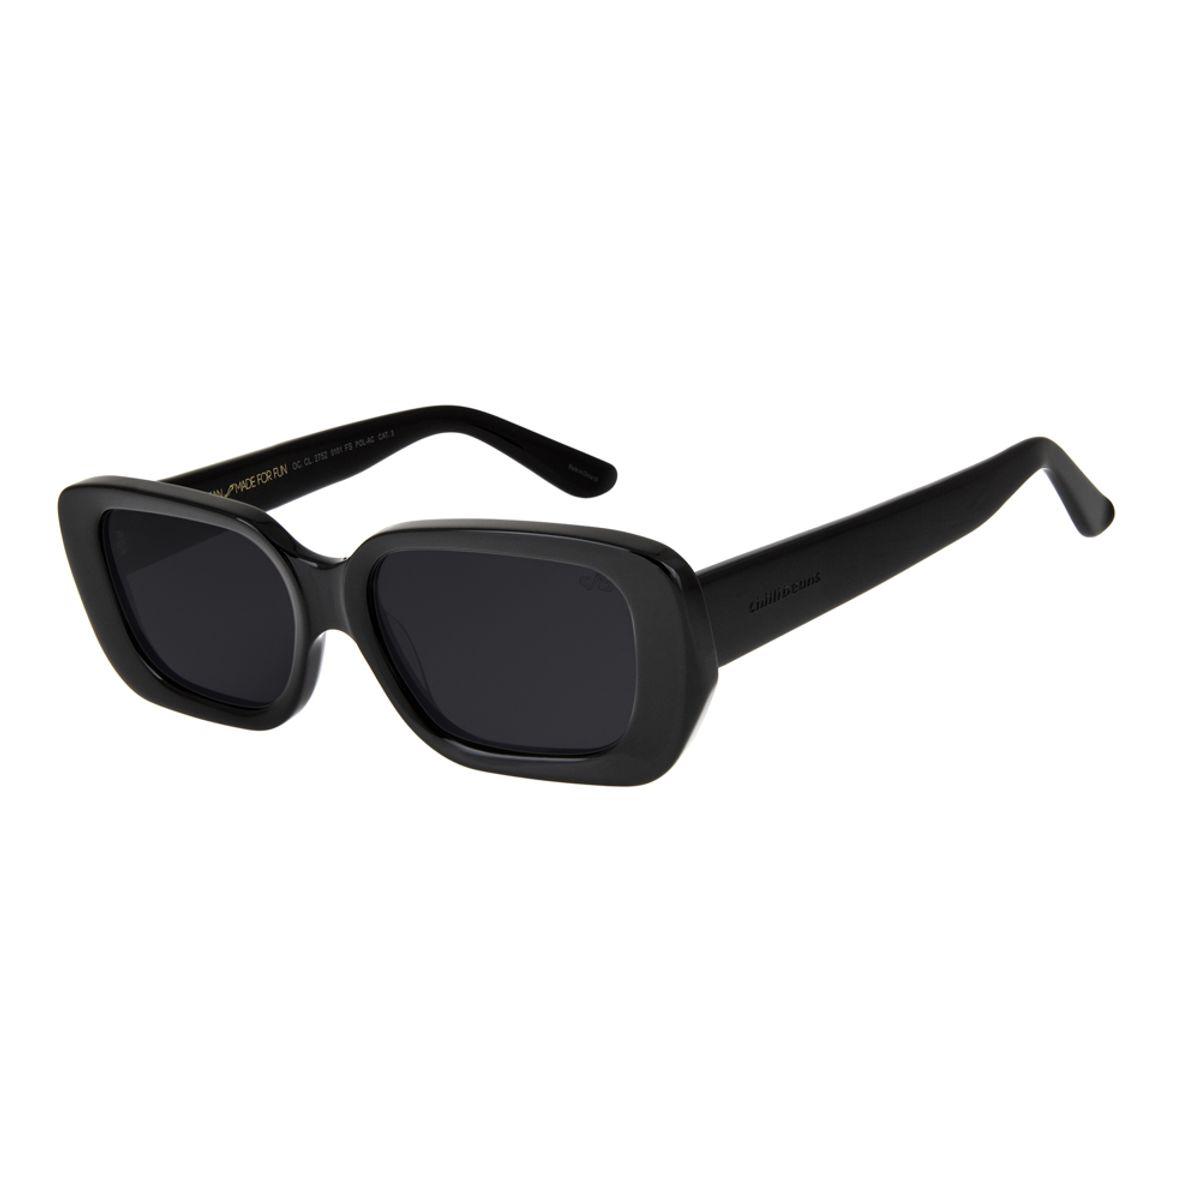 5aa20829c oculos de sol retangular 90´s grunge feminino chilli beans blk preto 2752  ...